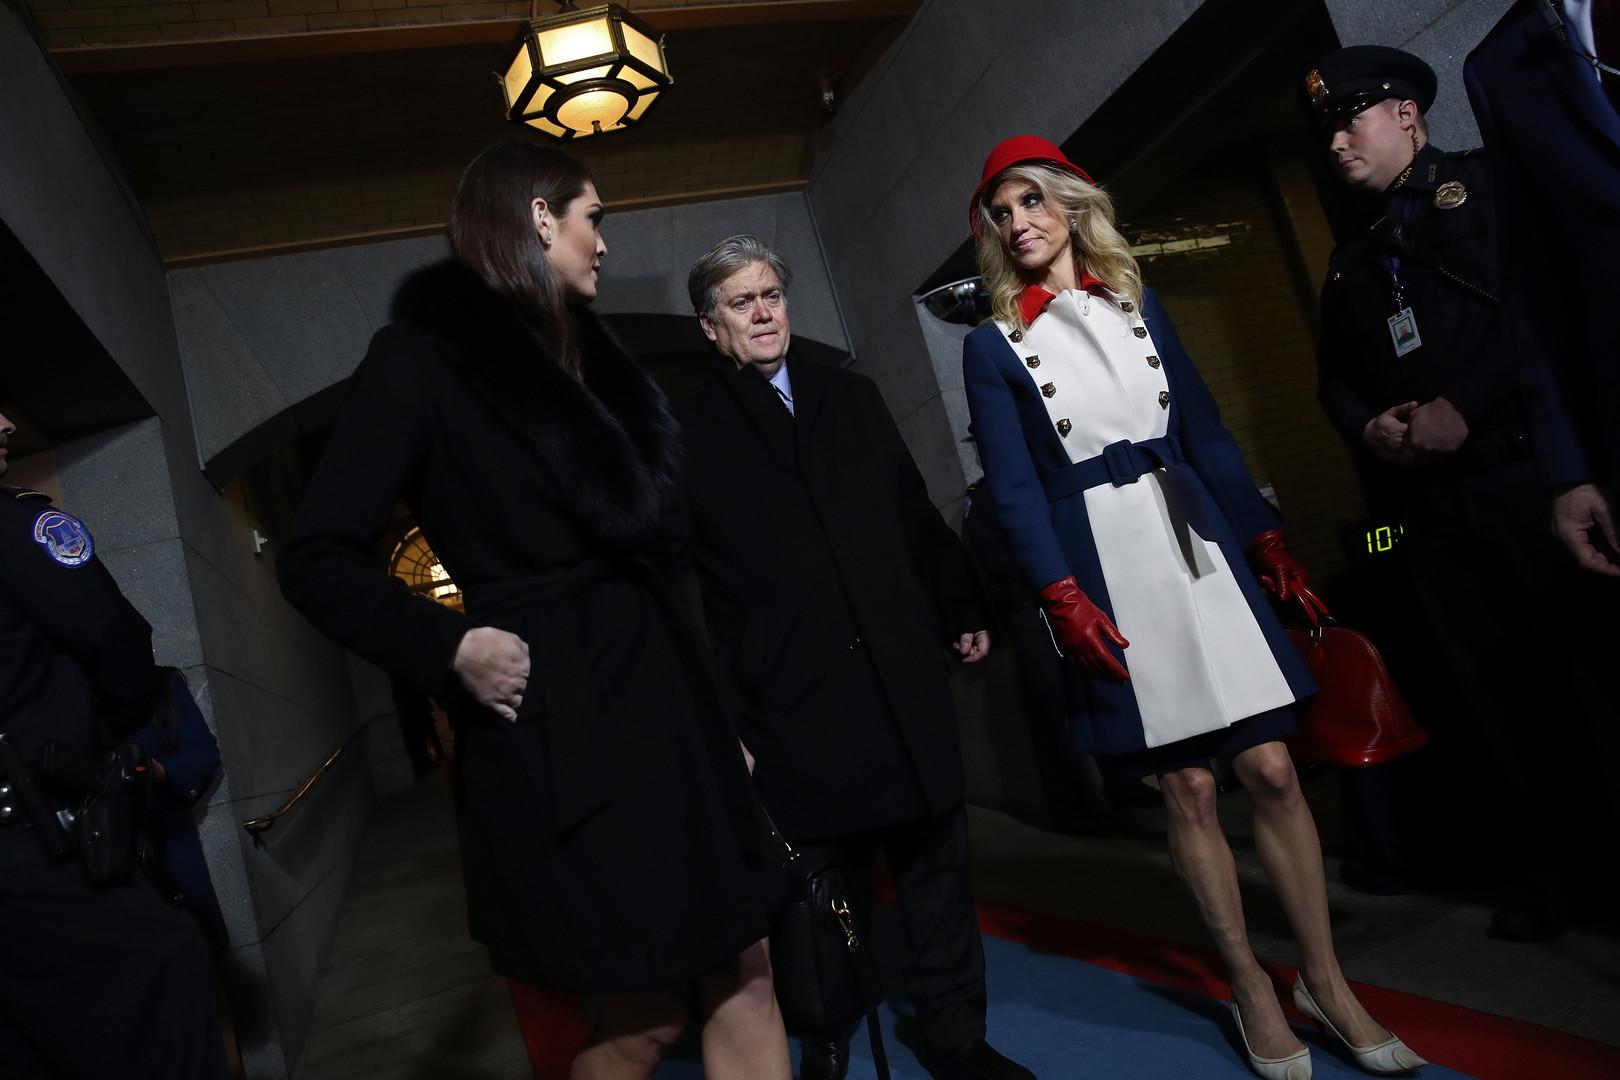 ميلانيا ترامب تستحضر جاكلين كنيدي